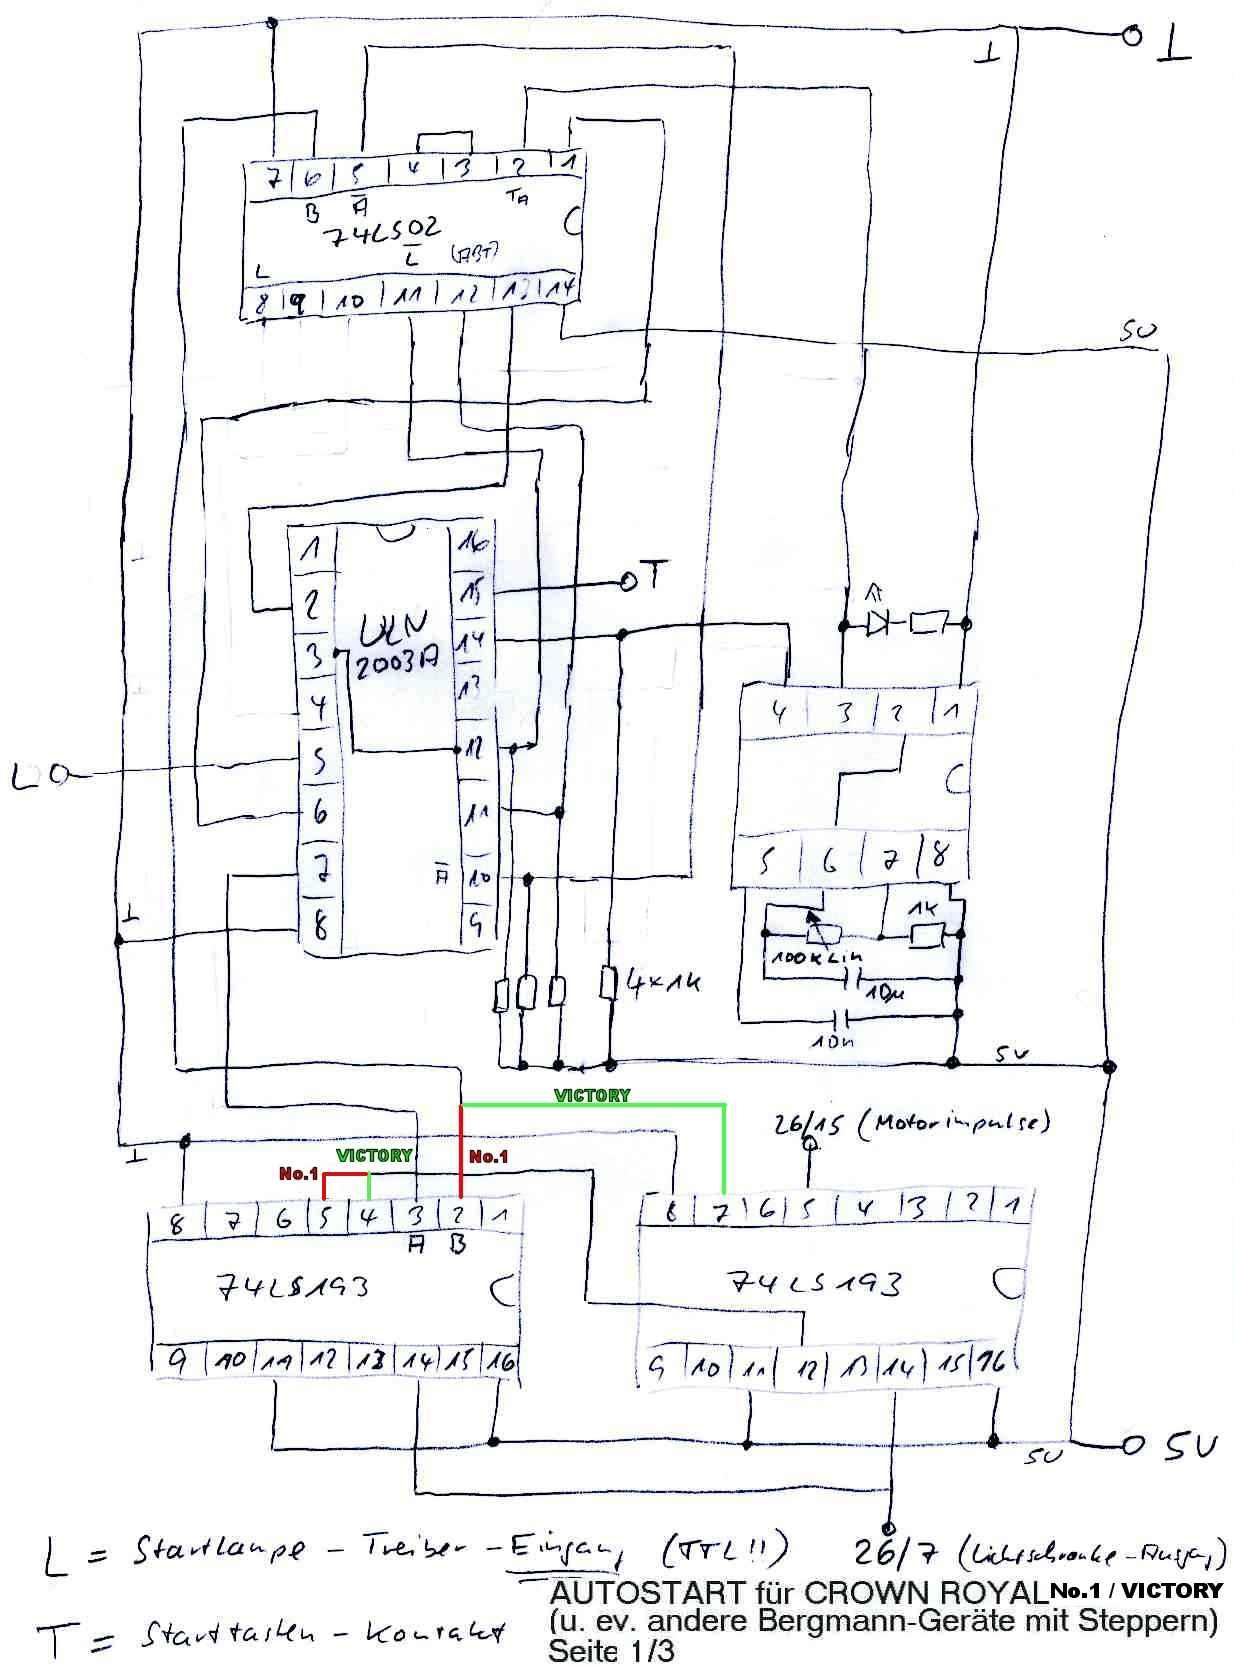 hercules 2000 wiring diagram wiring diagram perfomance  hercules 2000 wiring diagram #2